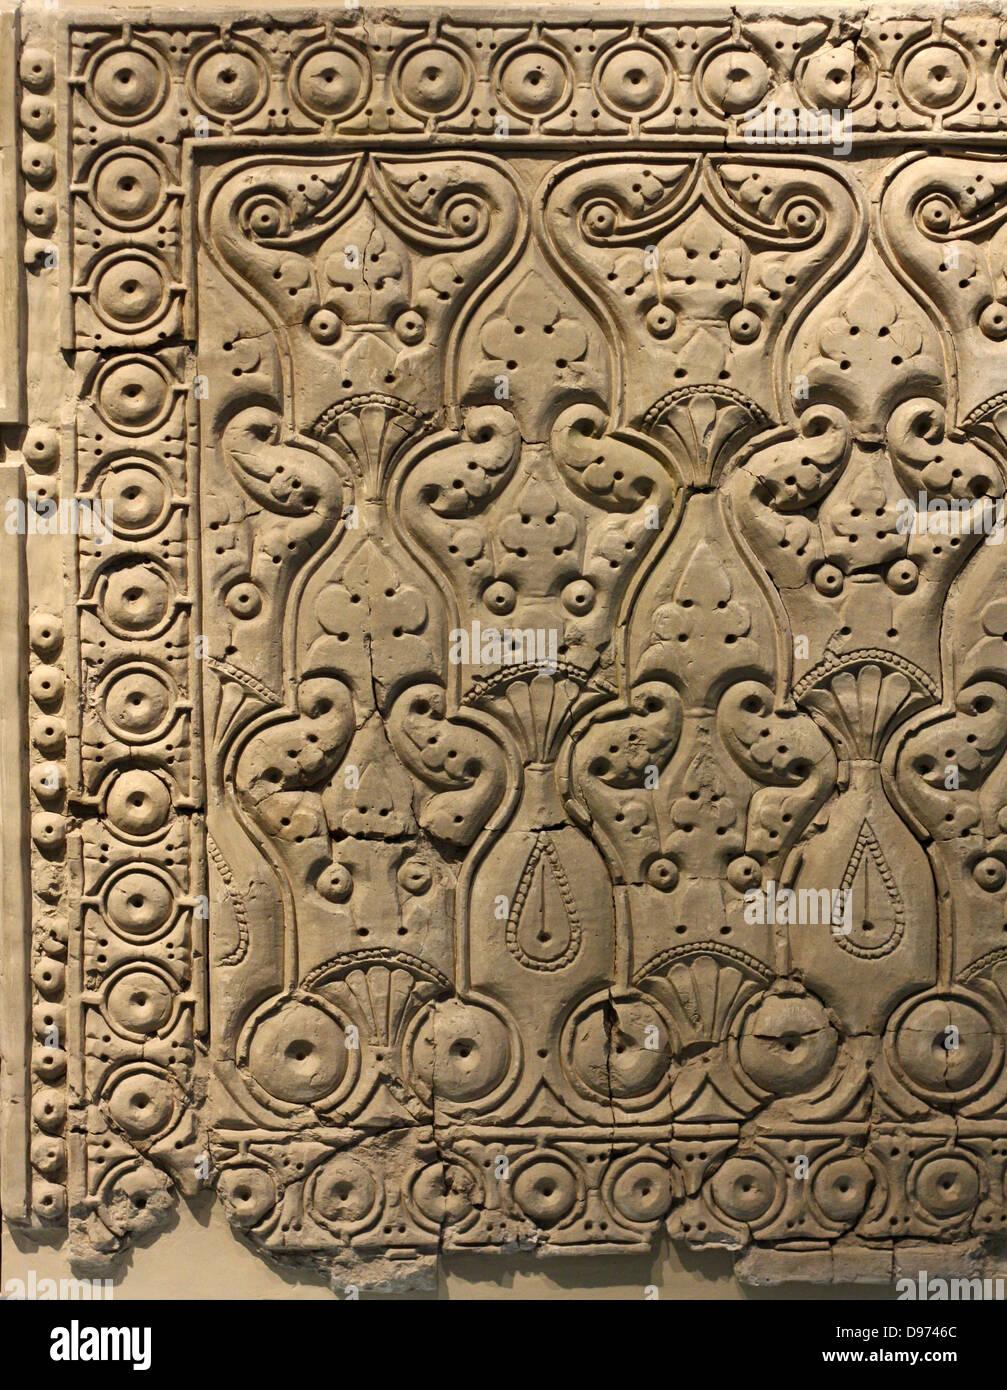 Interior Slant Stockfotos & Interior Slant Bilder - Alamy